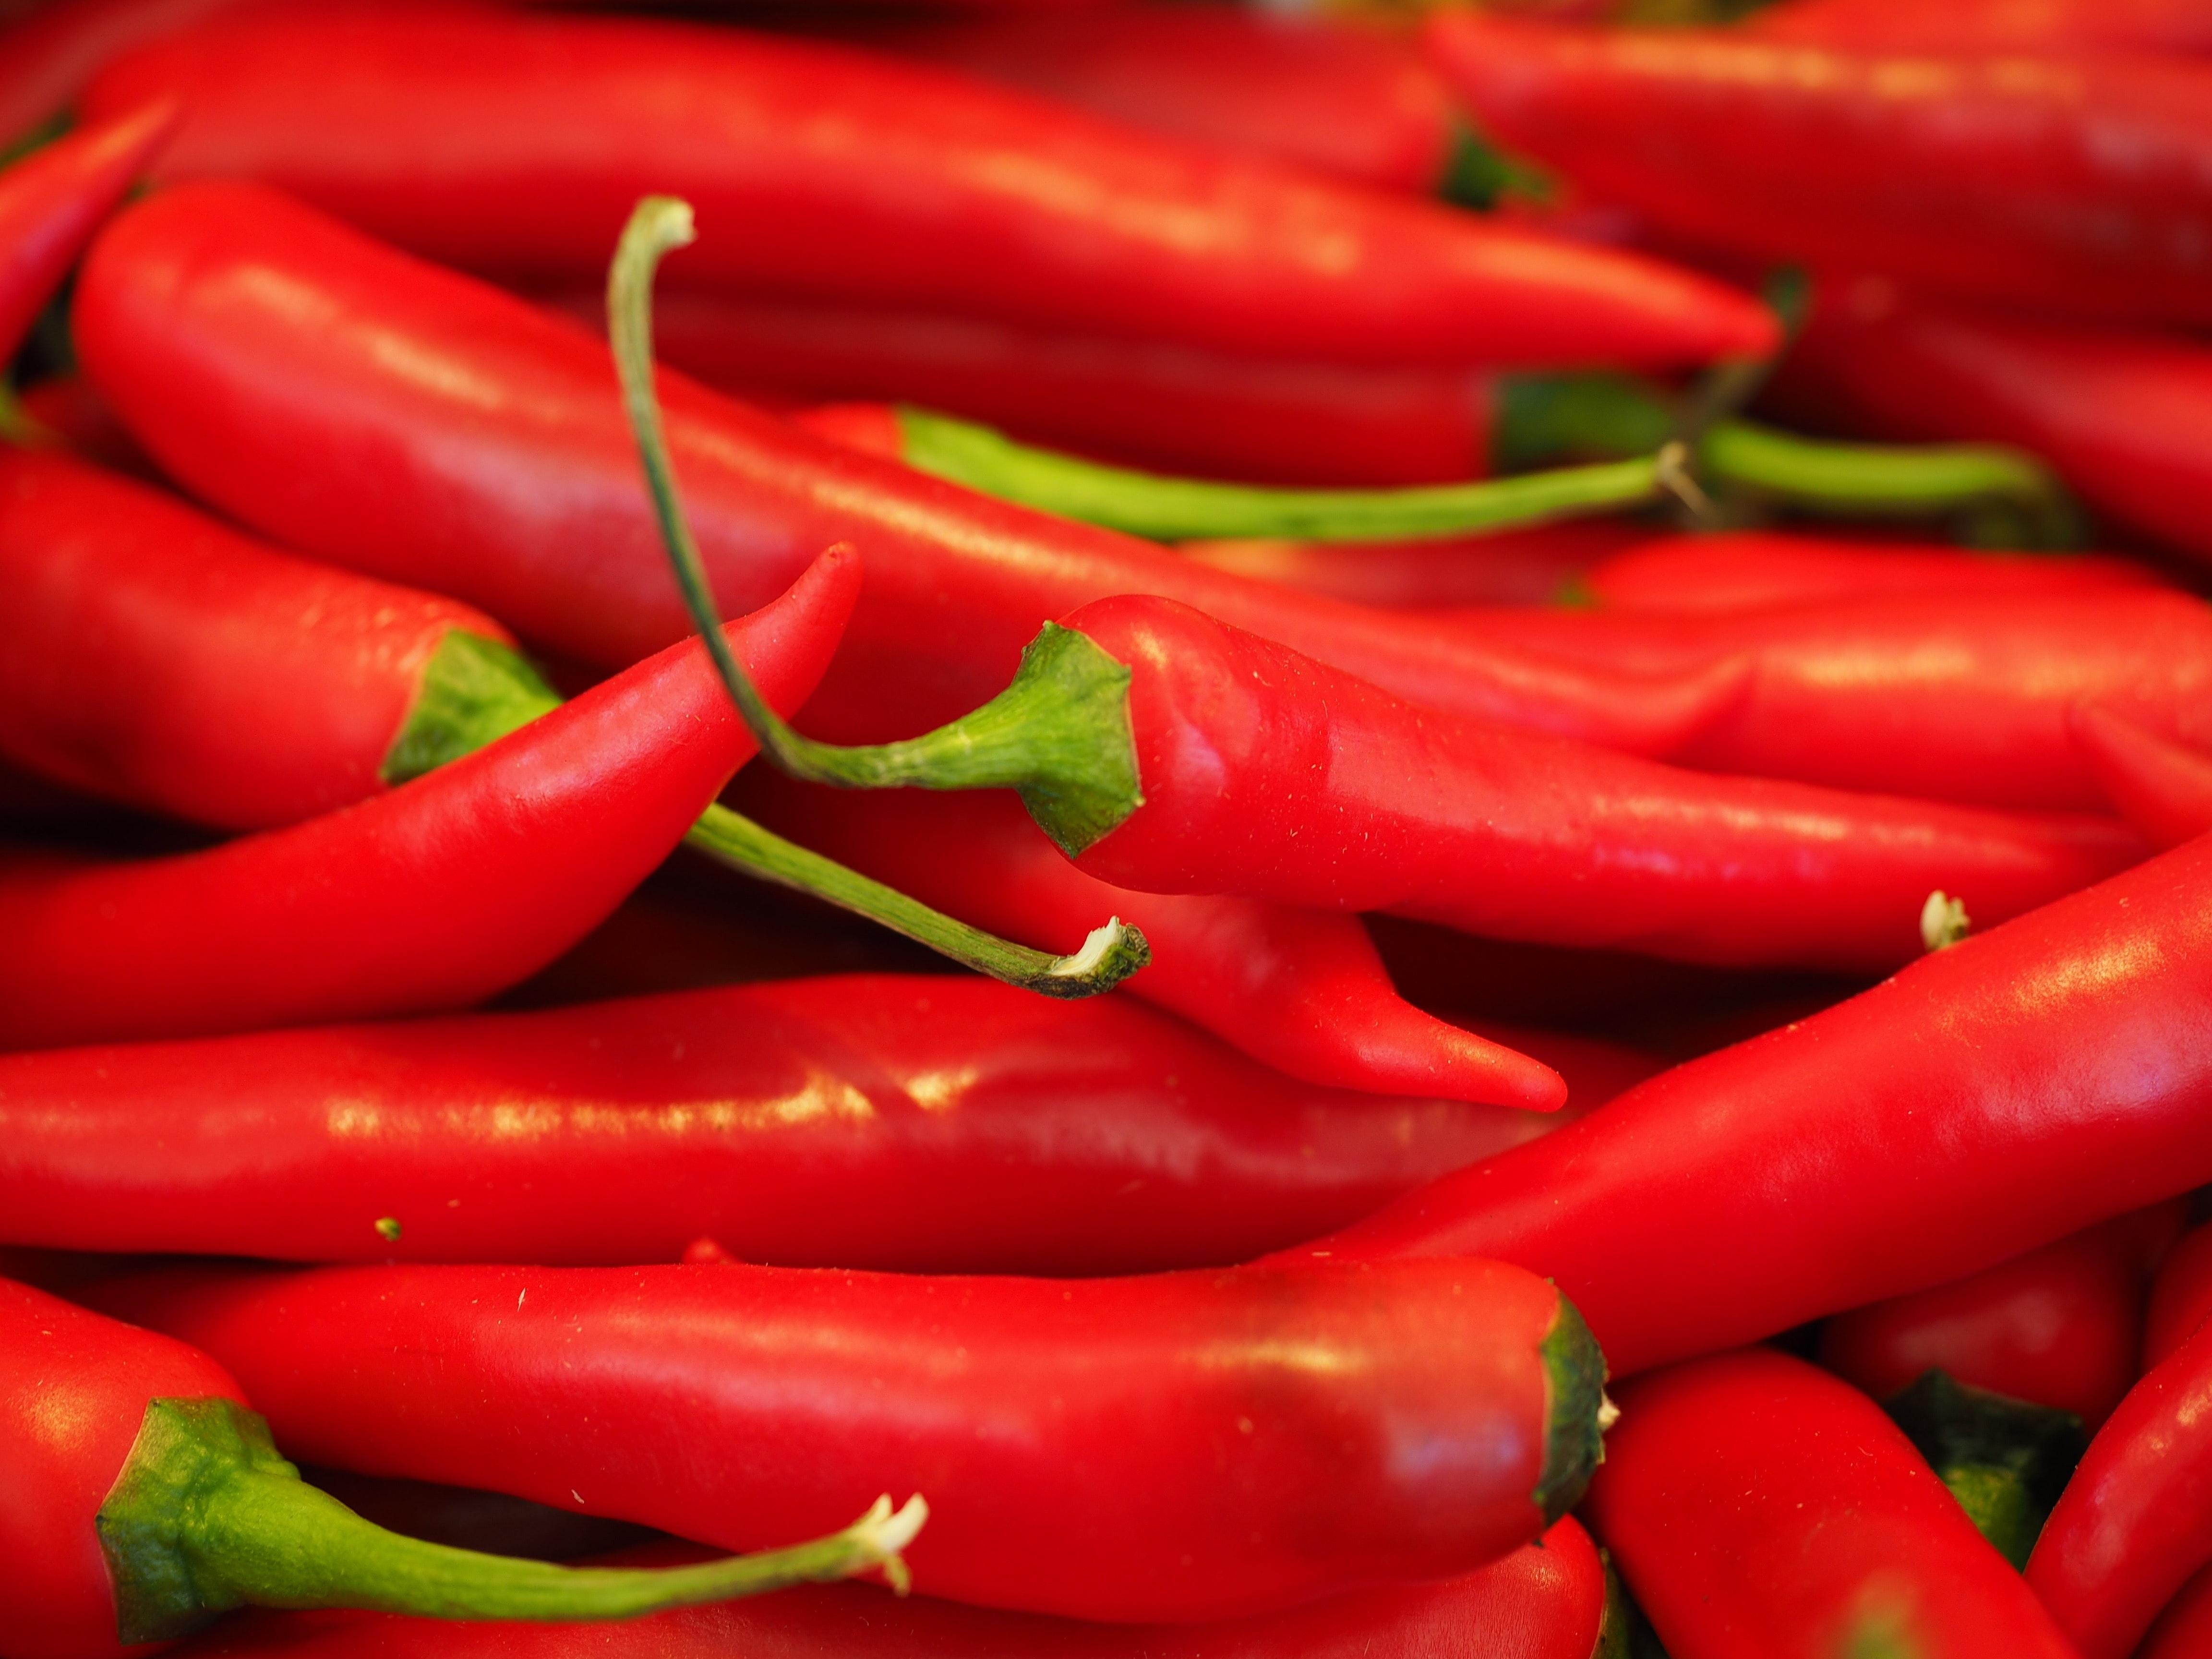 Red Chili Pepper Near Green Chili Pepper 183 Free Stock Photo